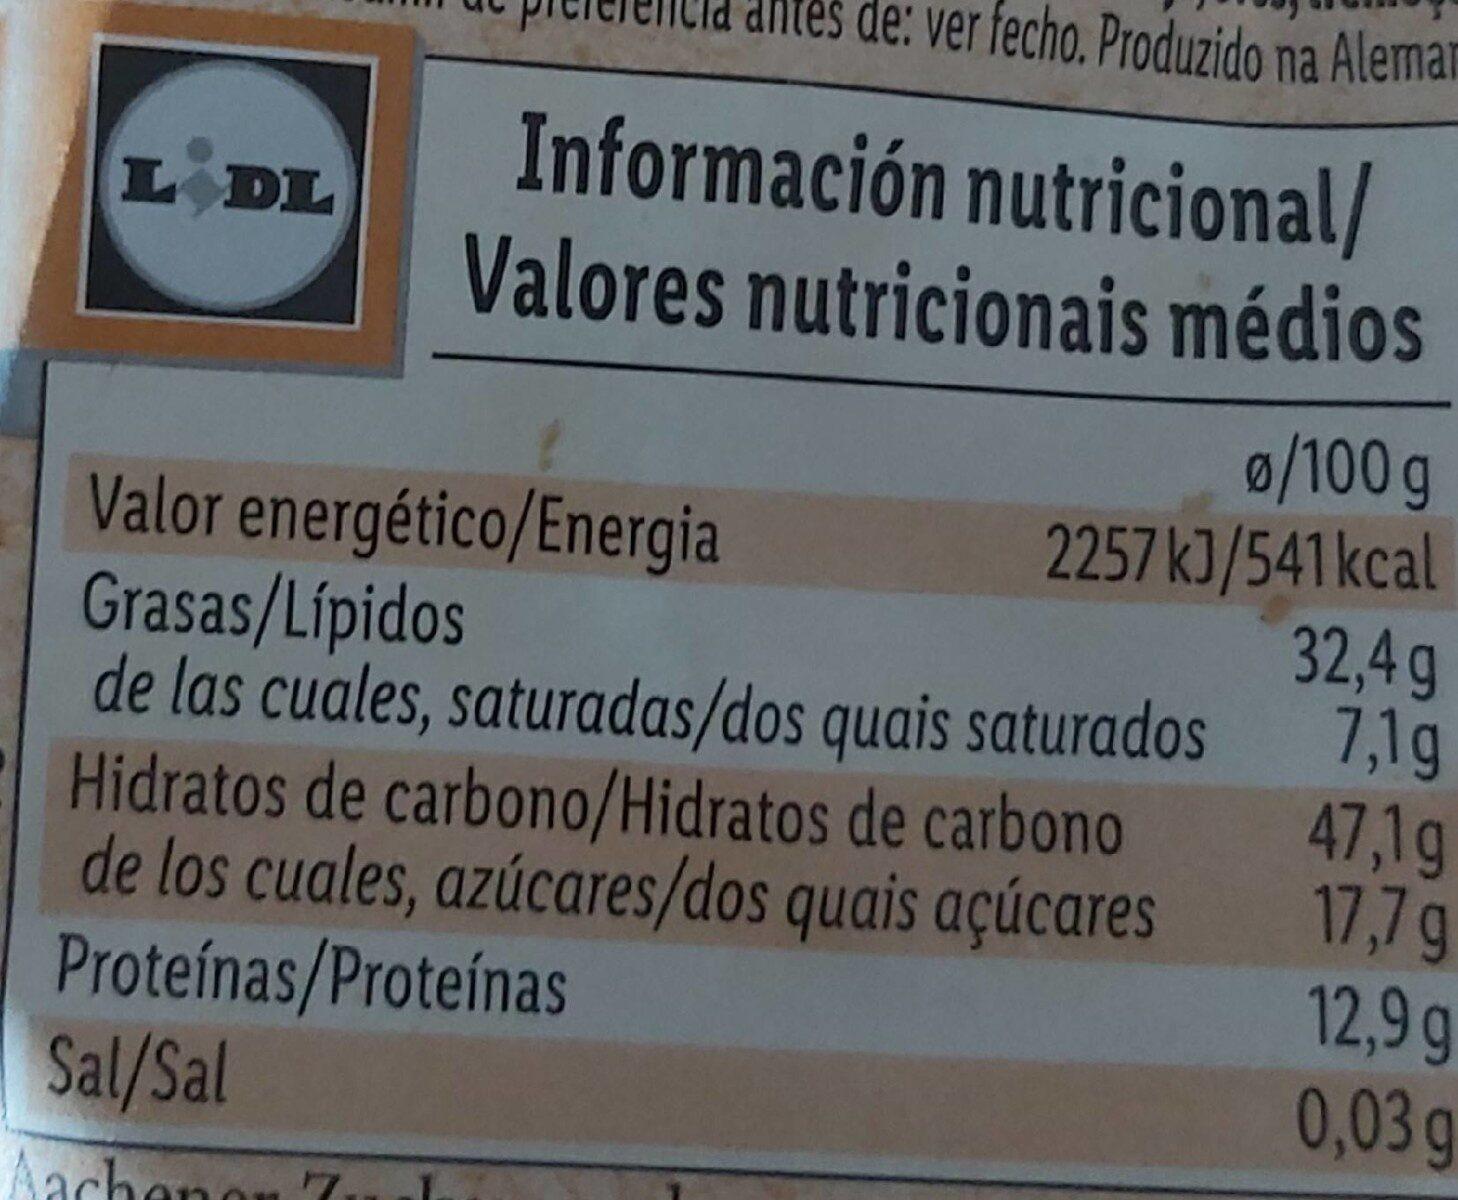 Galletas de avena, cacahuete y anacardo - Informação nutricional - es